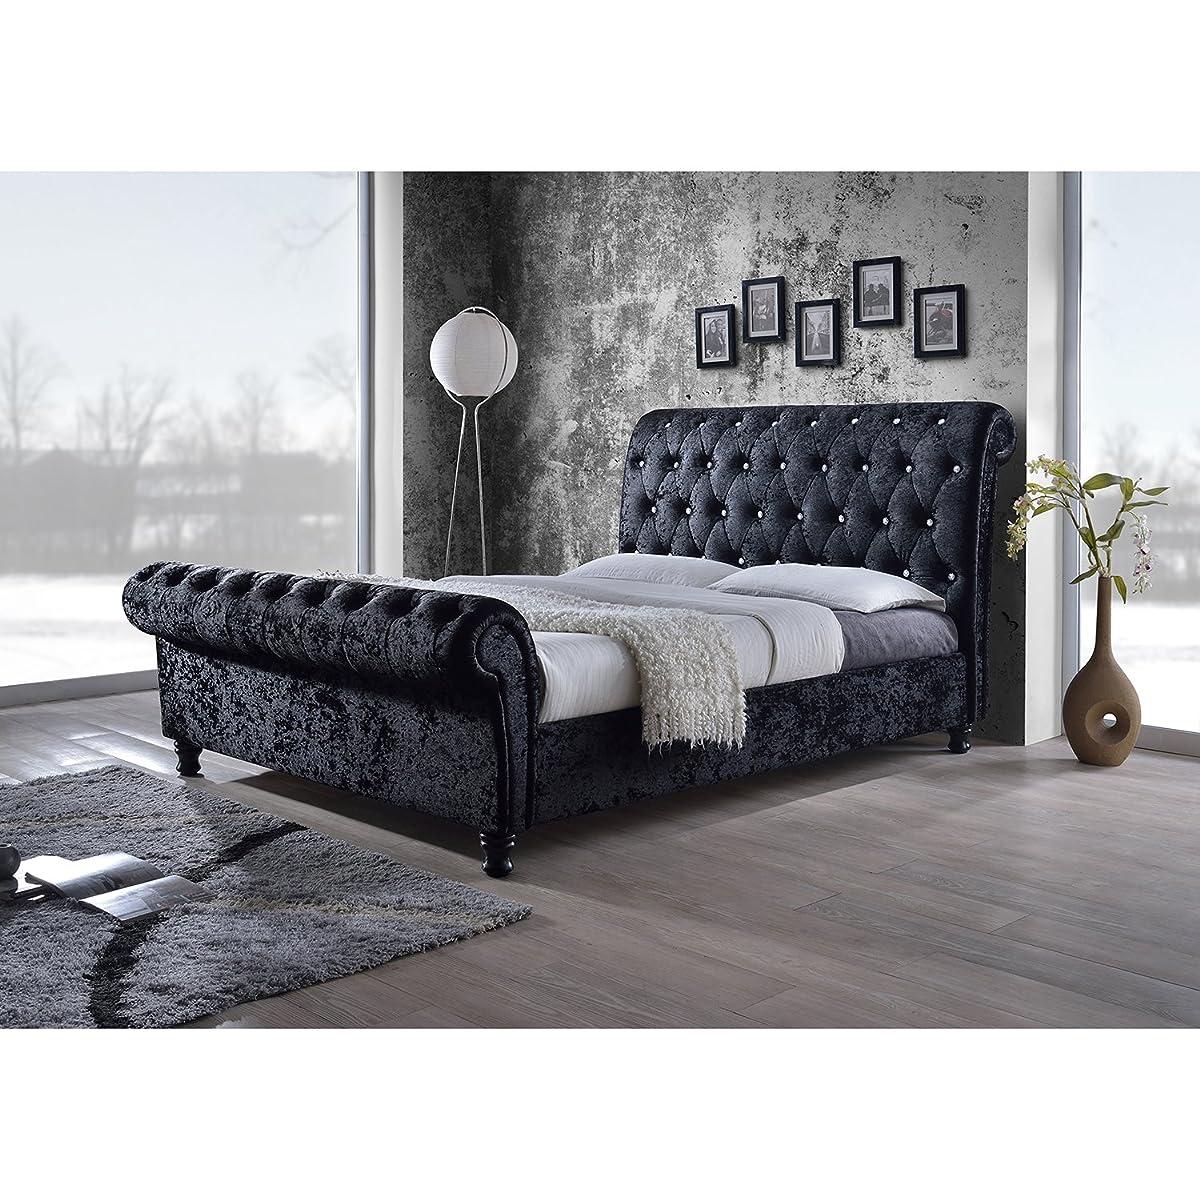 Baxton Studio Wholesale Interiors Castello Velvet Upholstered Faux Crystal-Buttoned Sleigh Platform Bed, Queen, Black